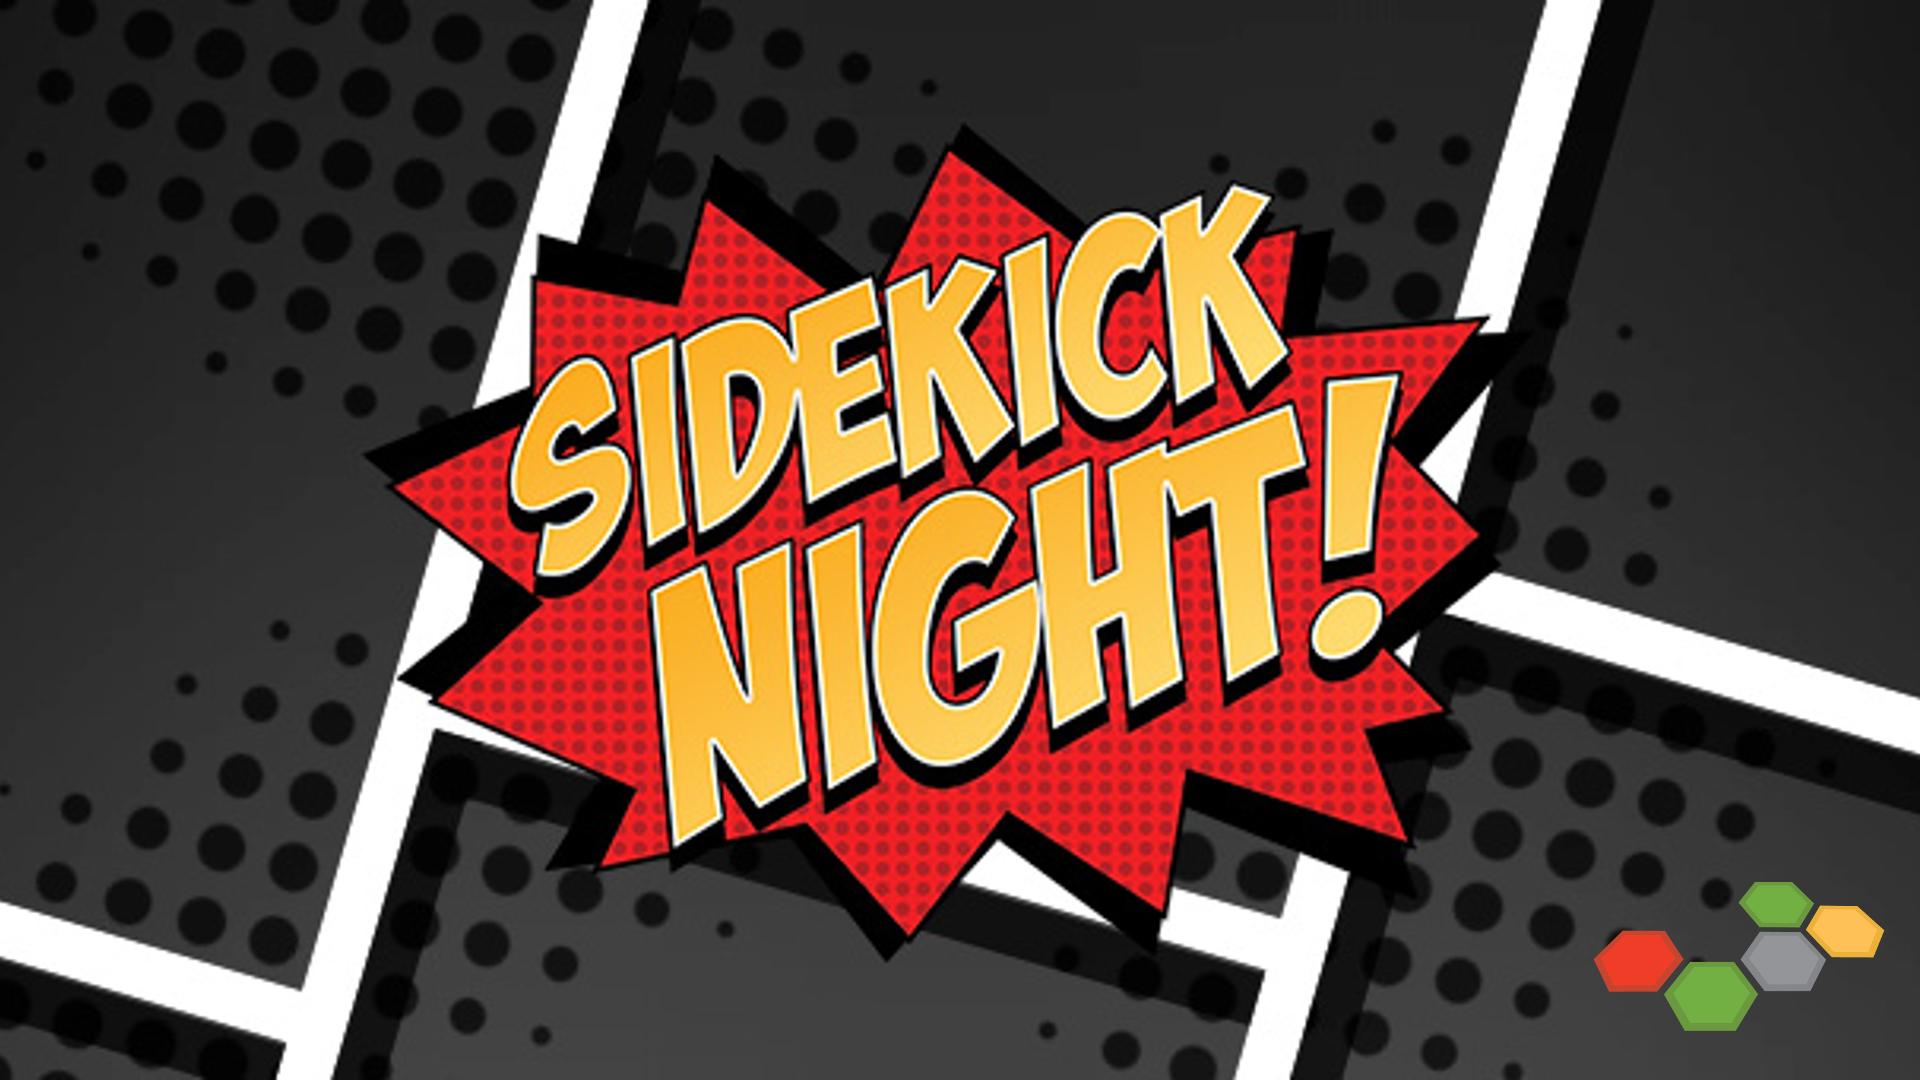 heroclix sidekick night event image.png